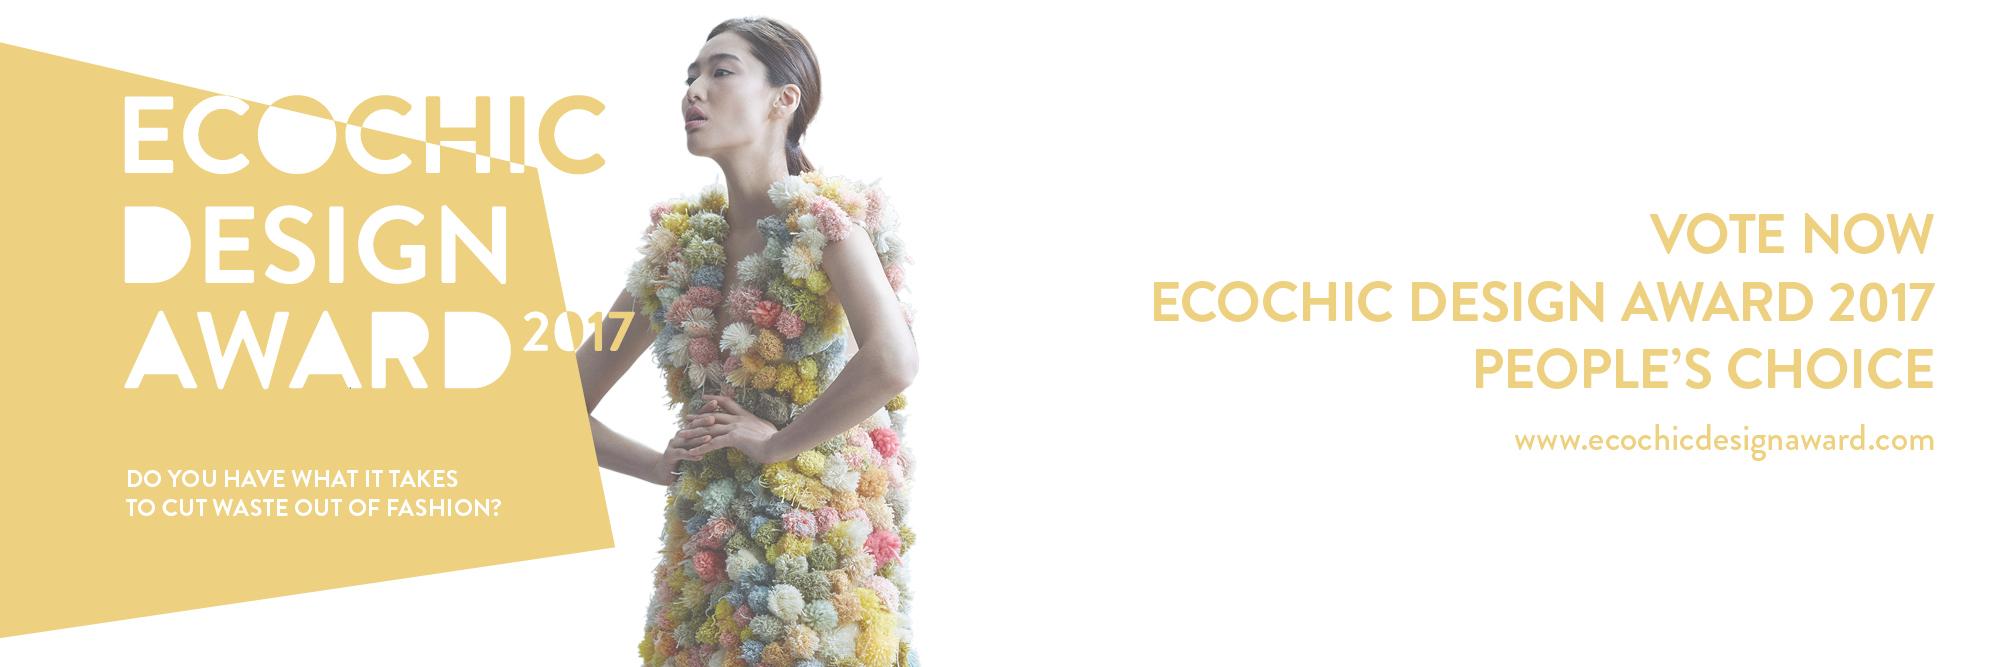 The Ecochic Design Award 2017 Semi Finalists Redress Design Award